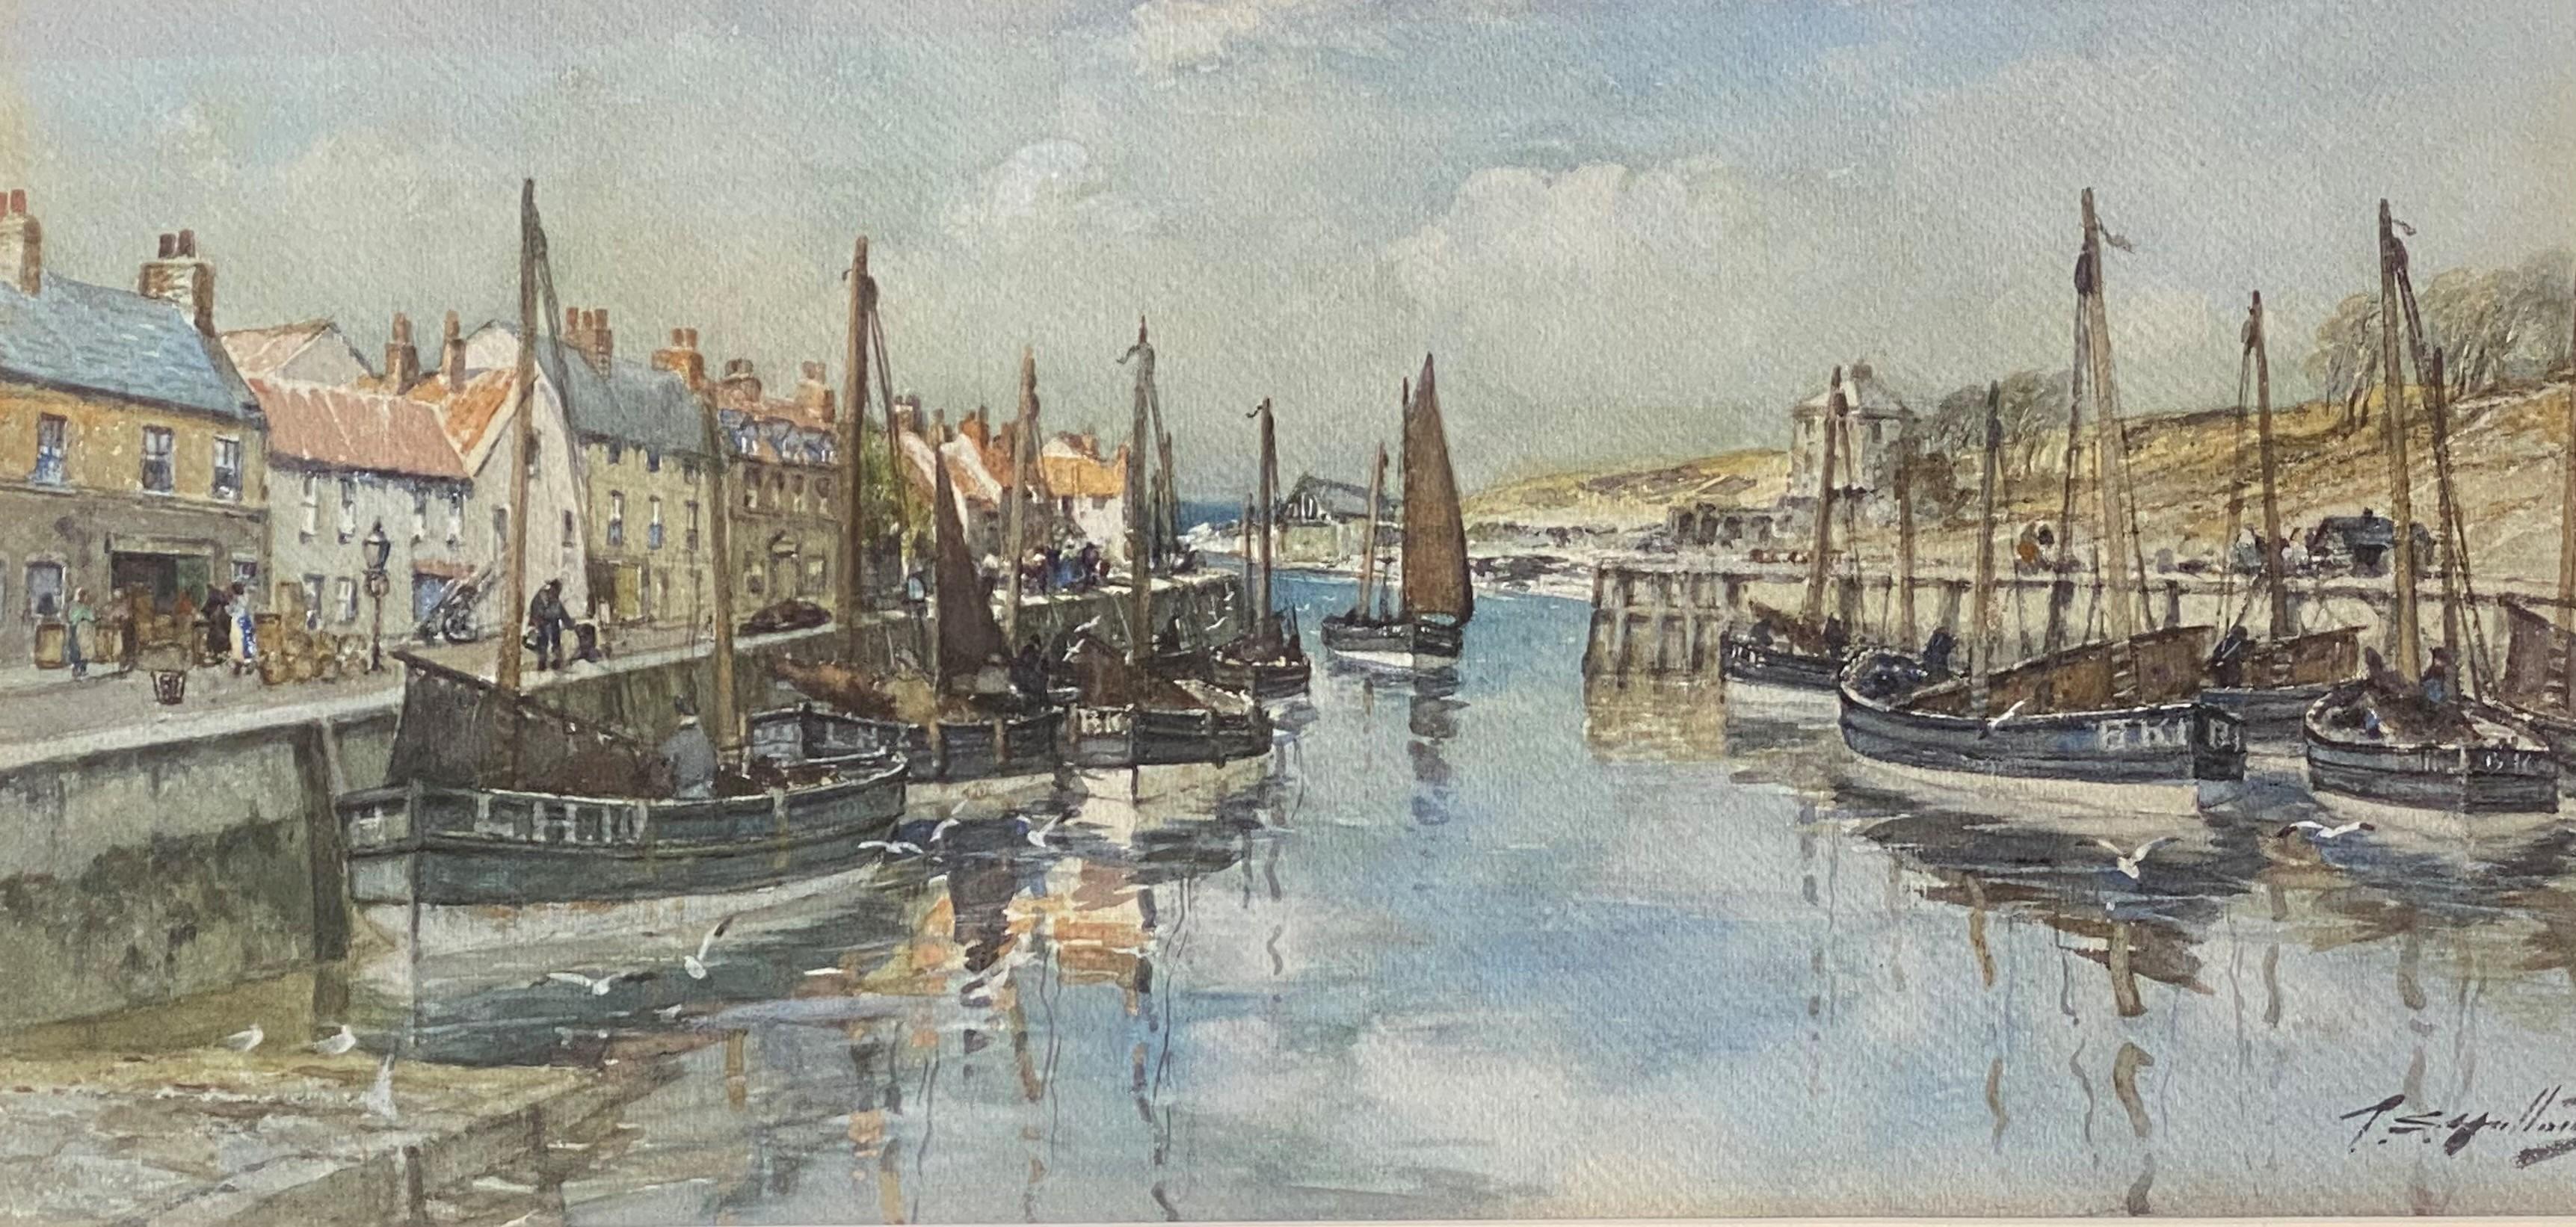 Thomas Swift Hutton 1860-1935 (Scottish) signed watercolour Eyemouth harbour - Image 4 of 4